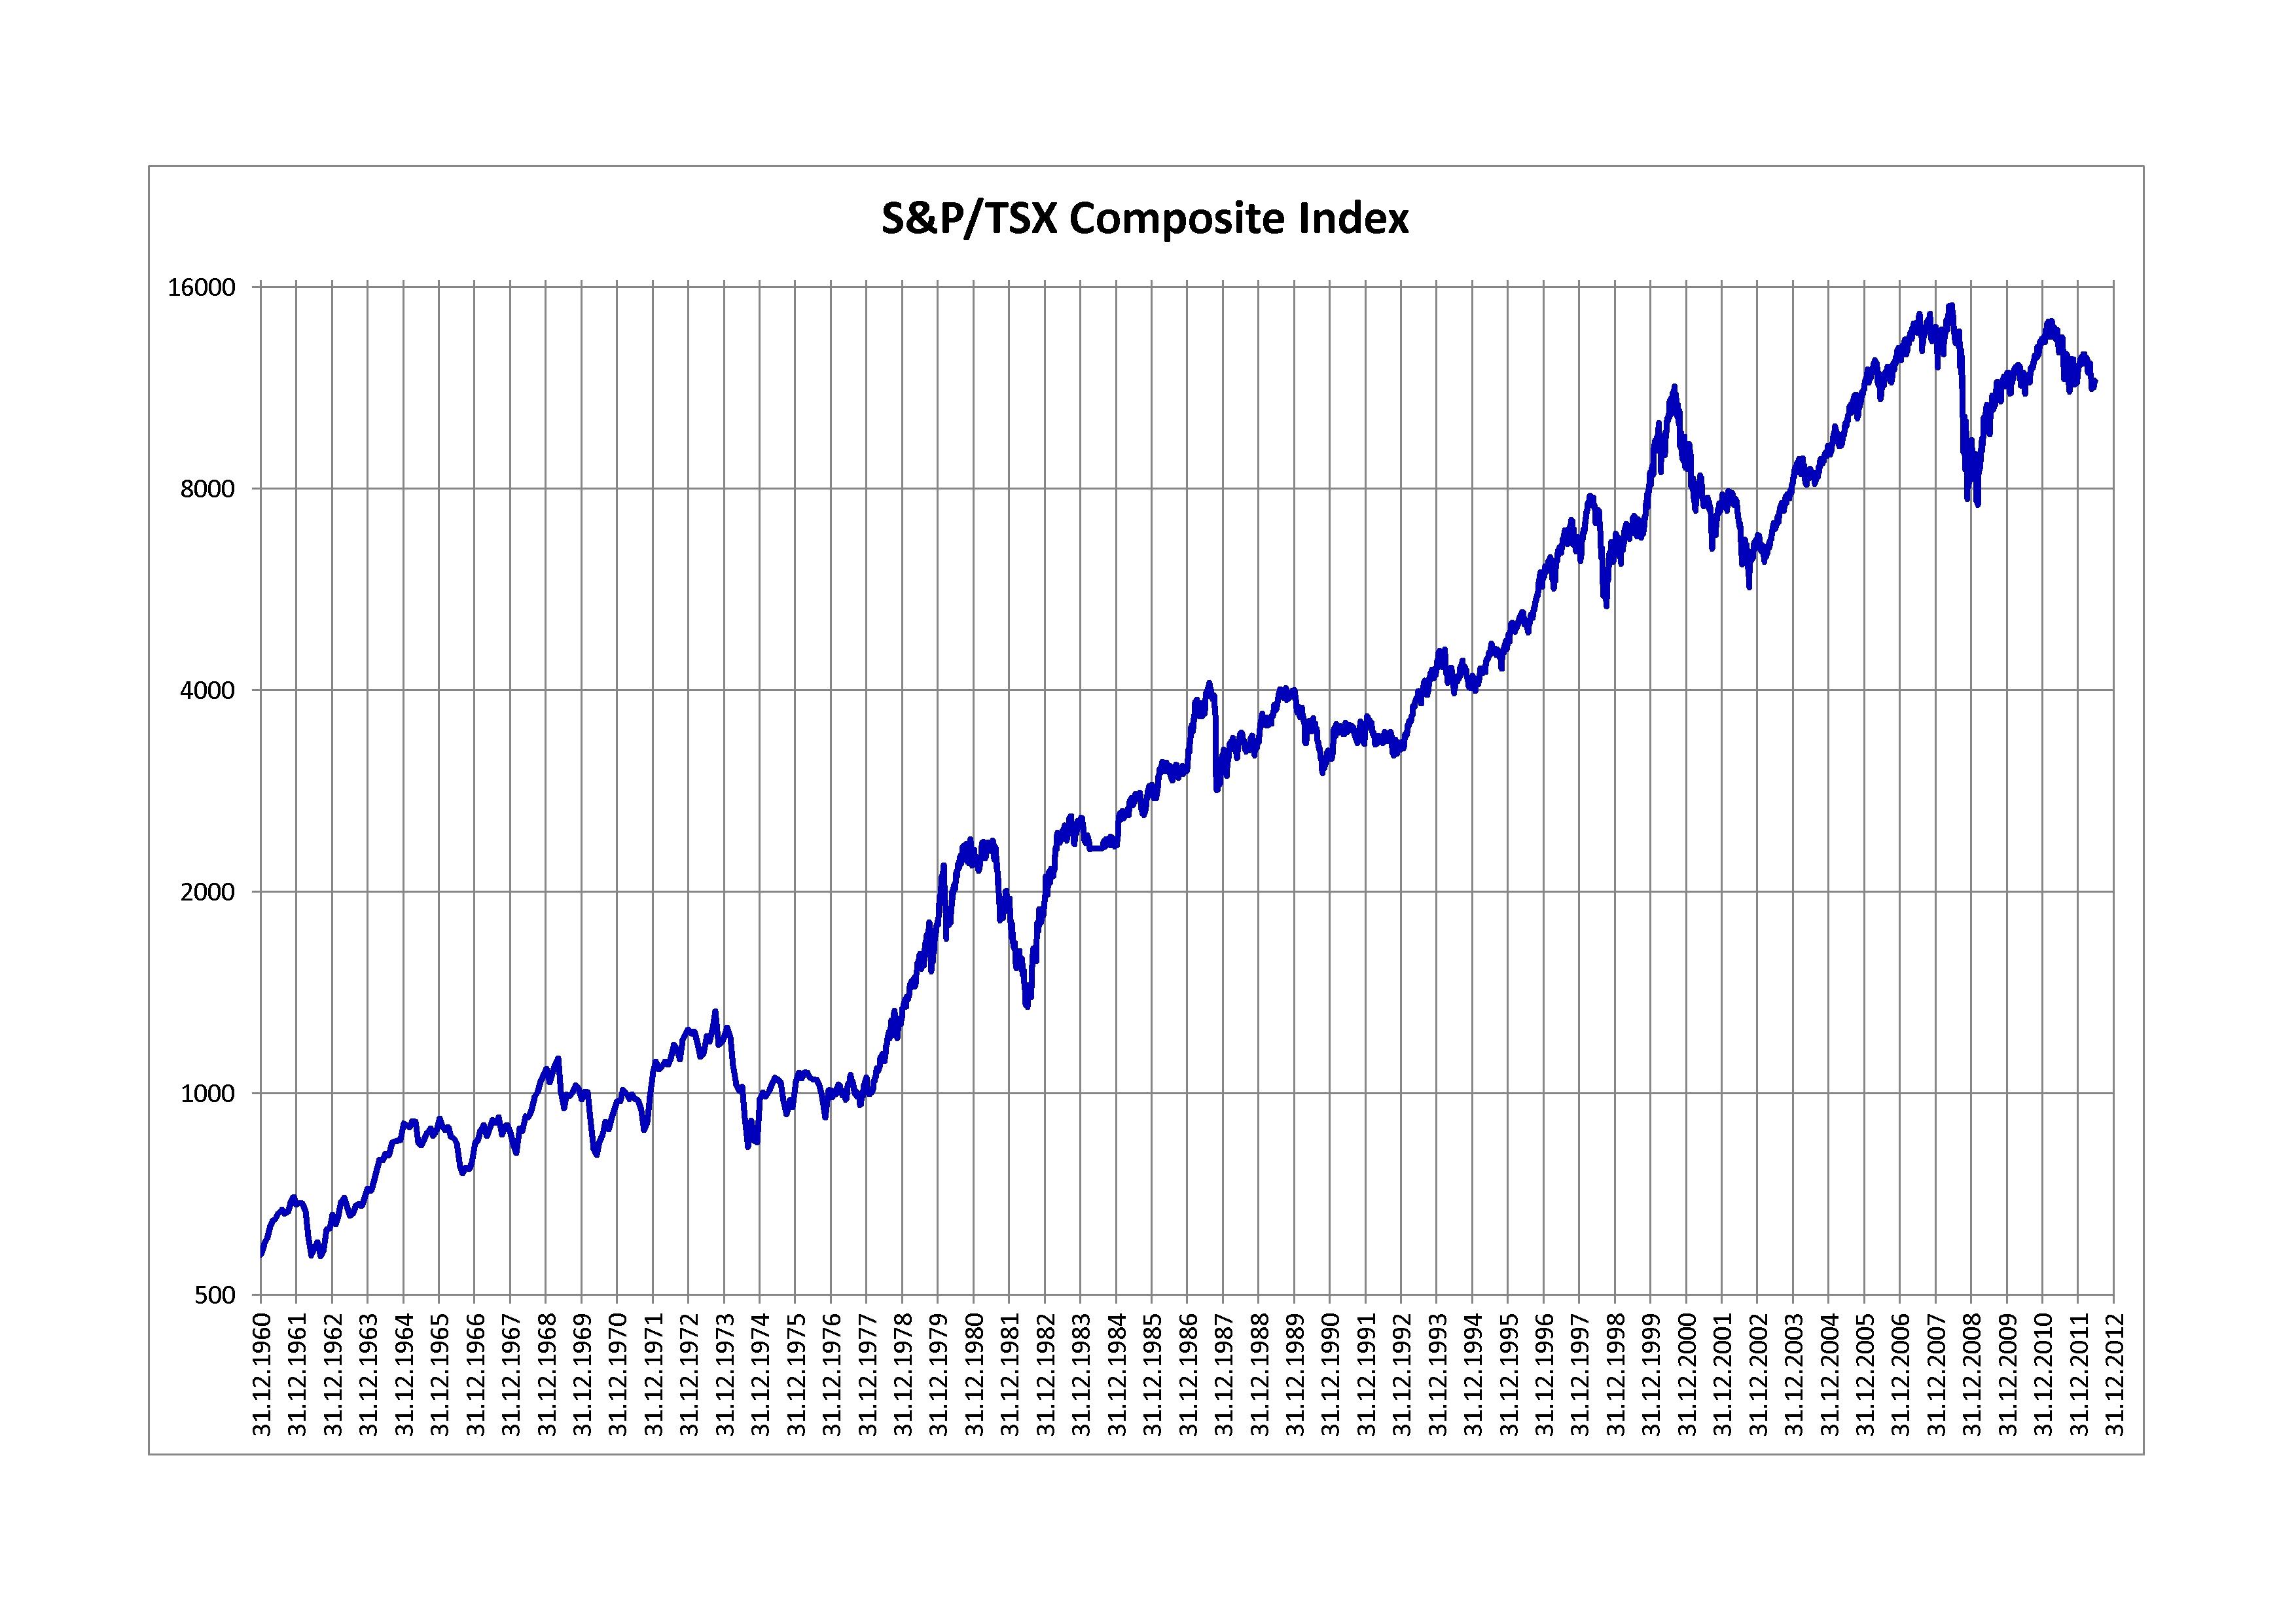 S&p/tsx Composite Index - Wikipedia